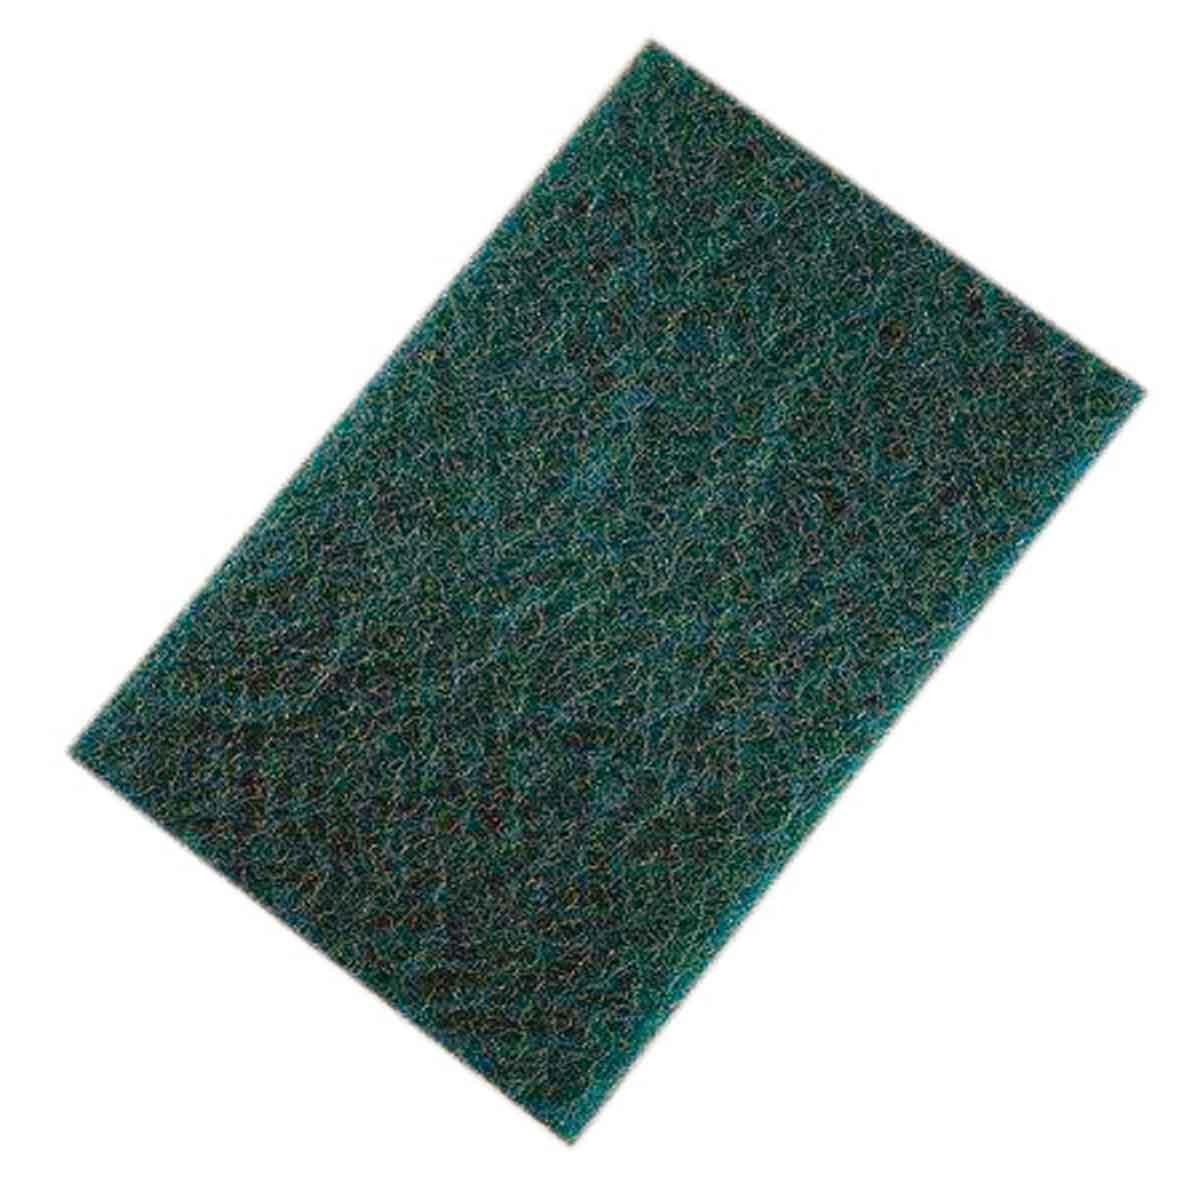 ULTP69GRN Pearl Abrasive